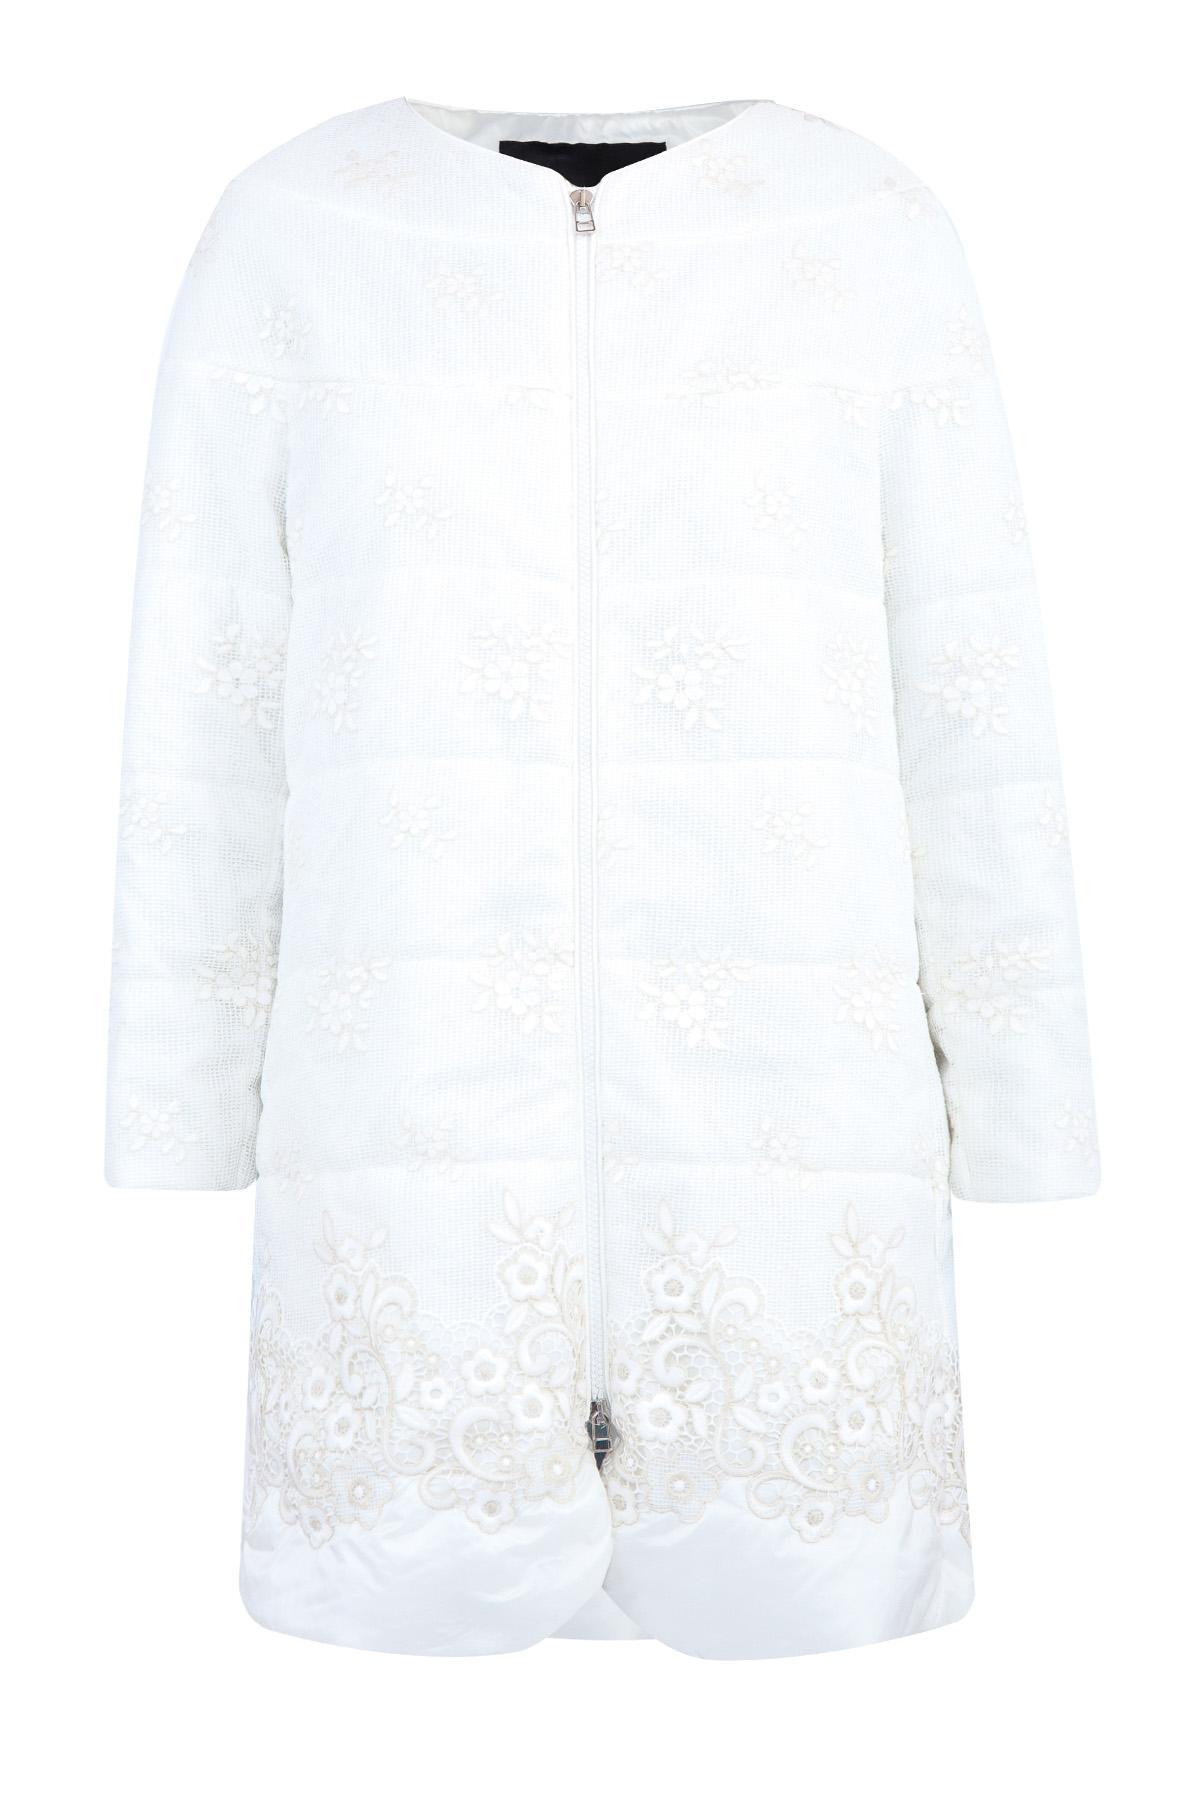 Купить Куртка, ERMANNO ERMANNO SCERVINO, Италия, полиэстер 100%